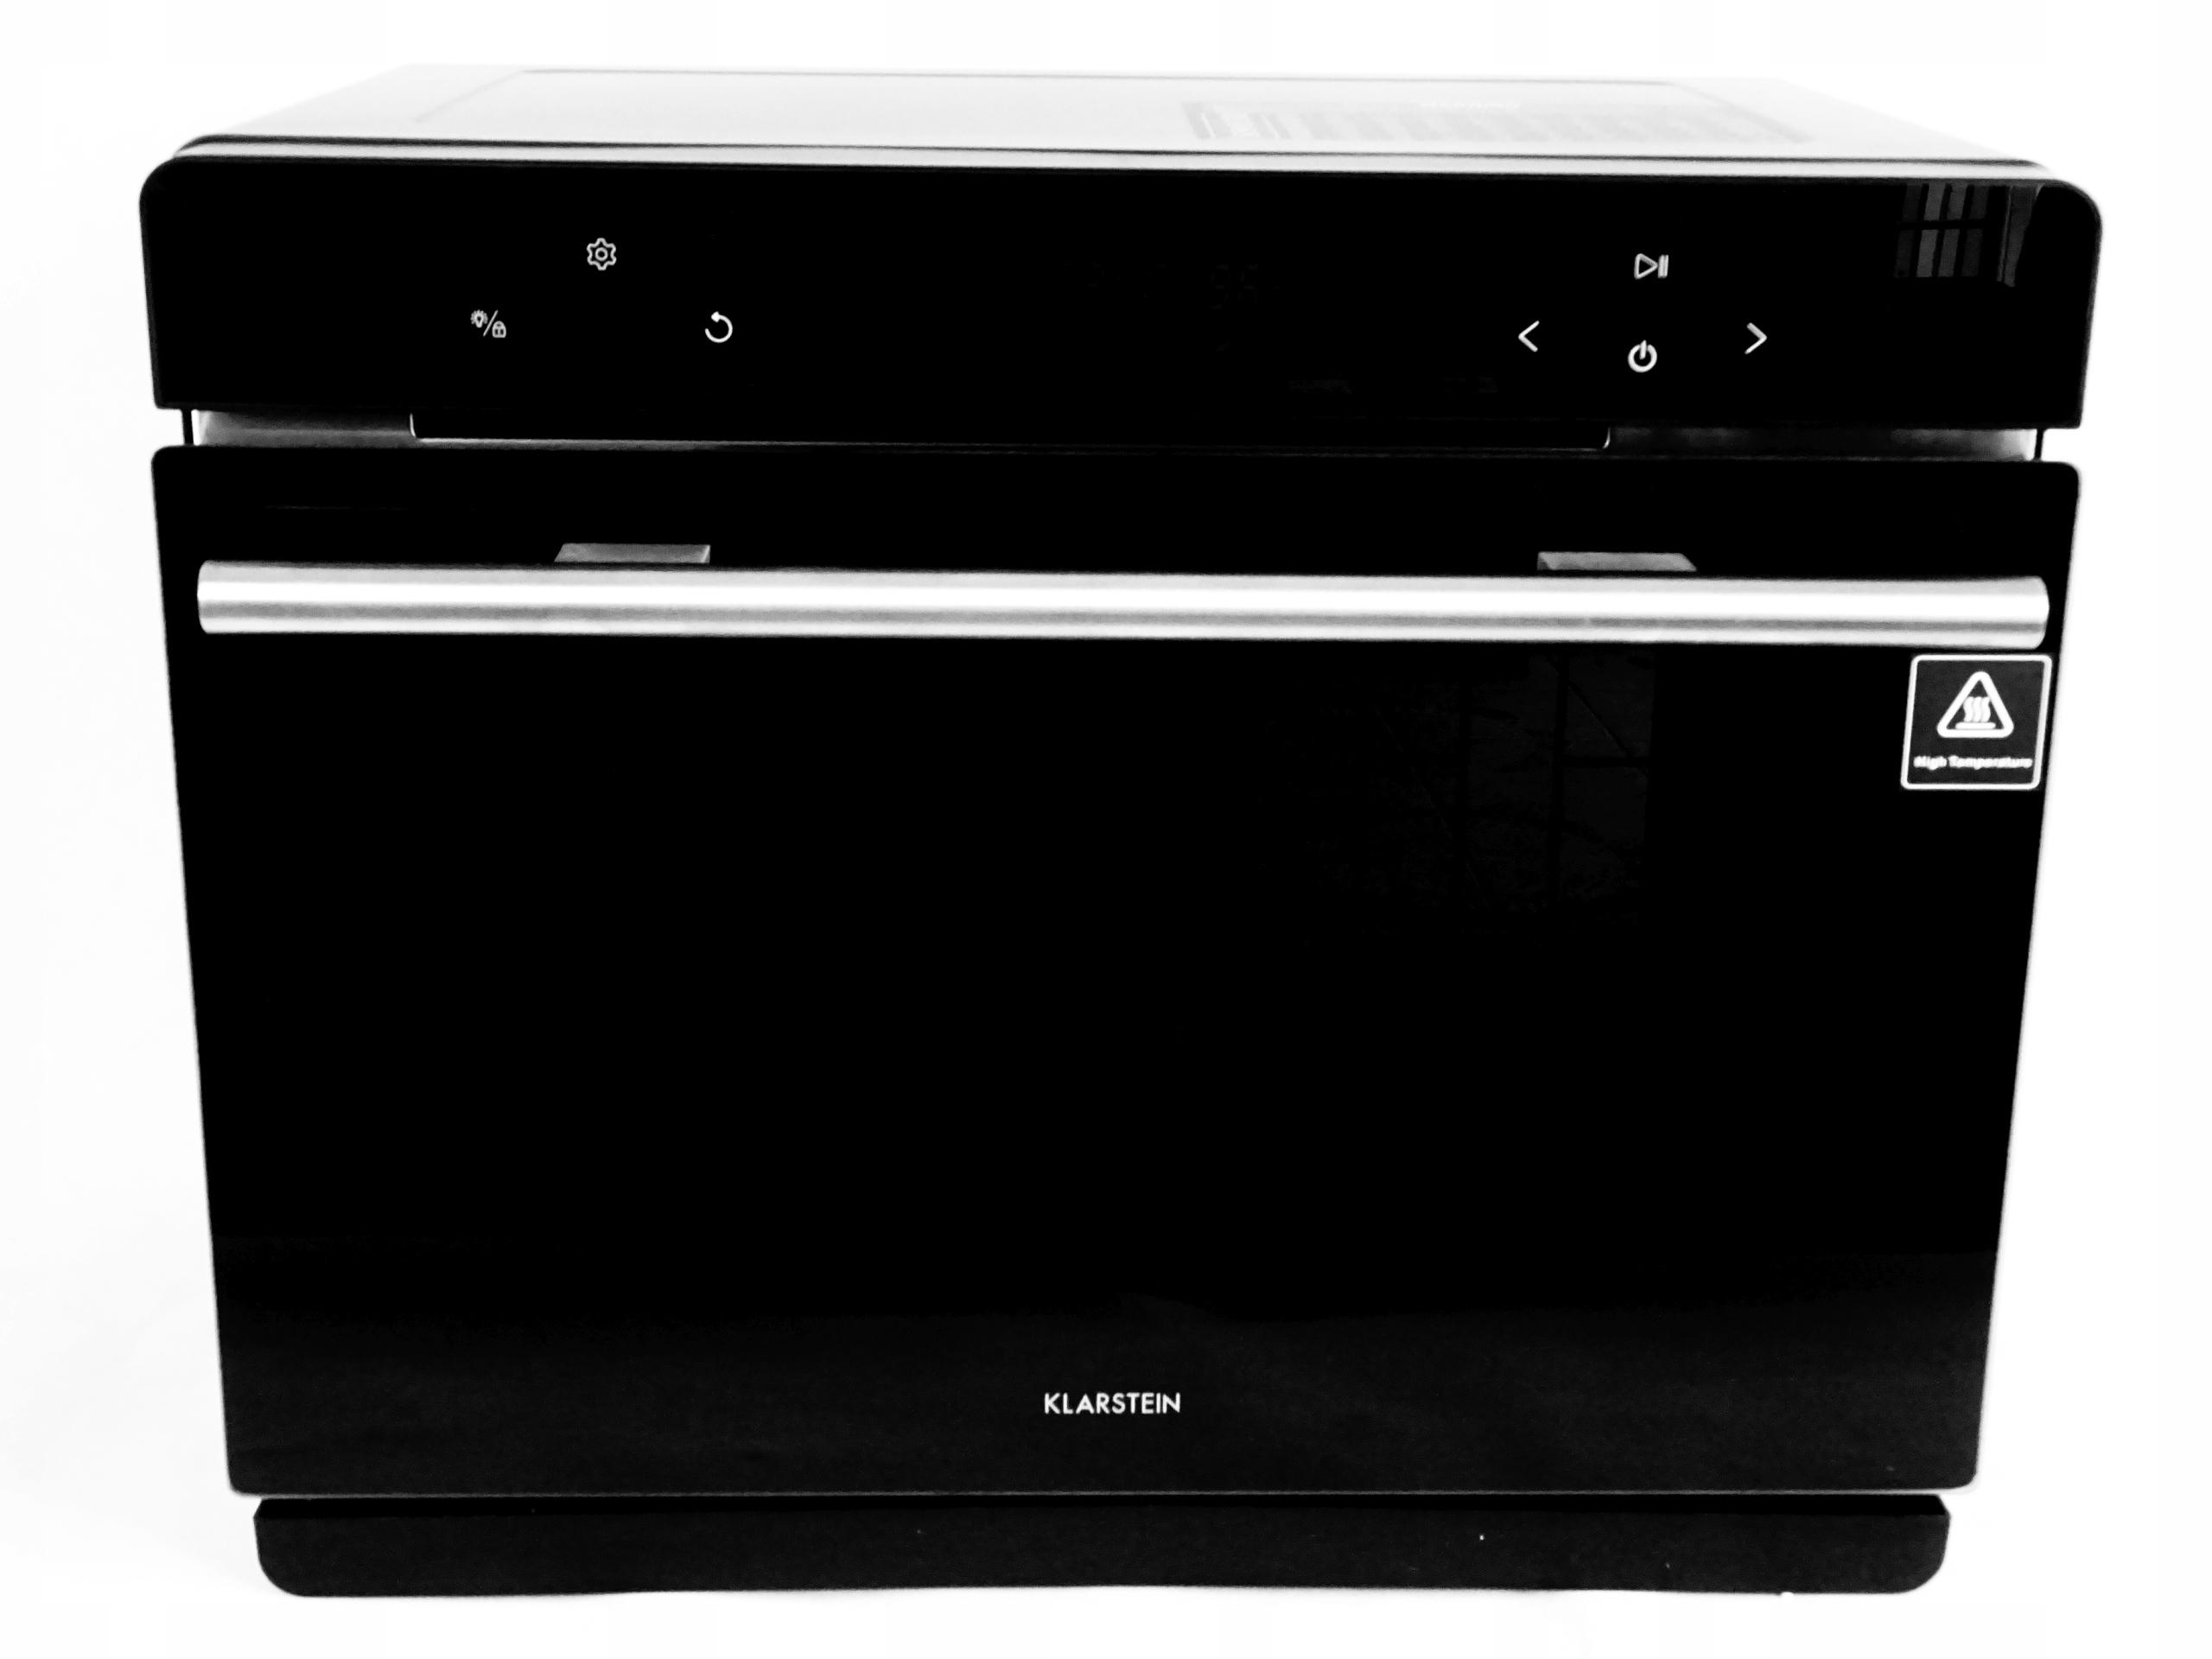 Klarstein MasterFresh 2200 W 230 ° C паровой духовой шкаф